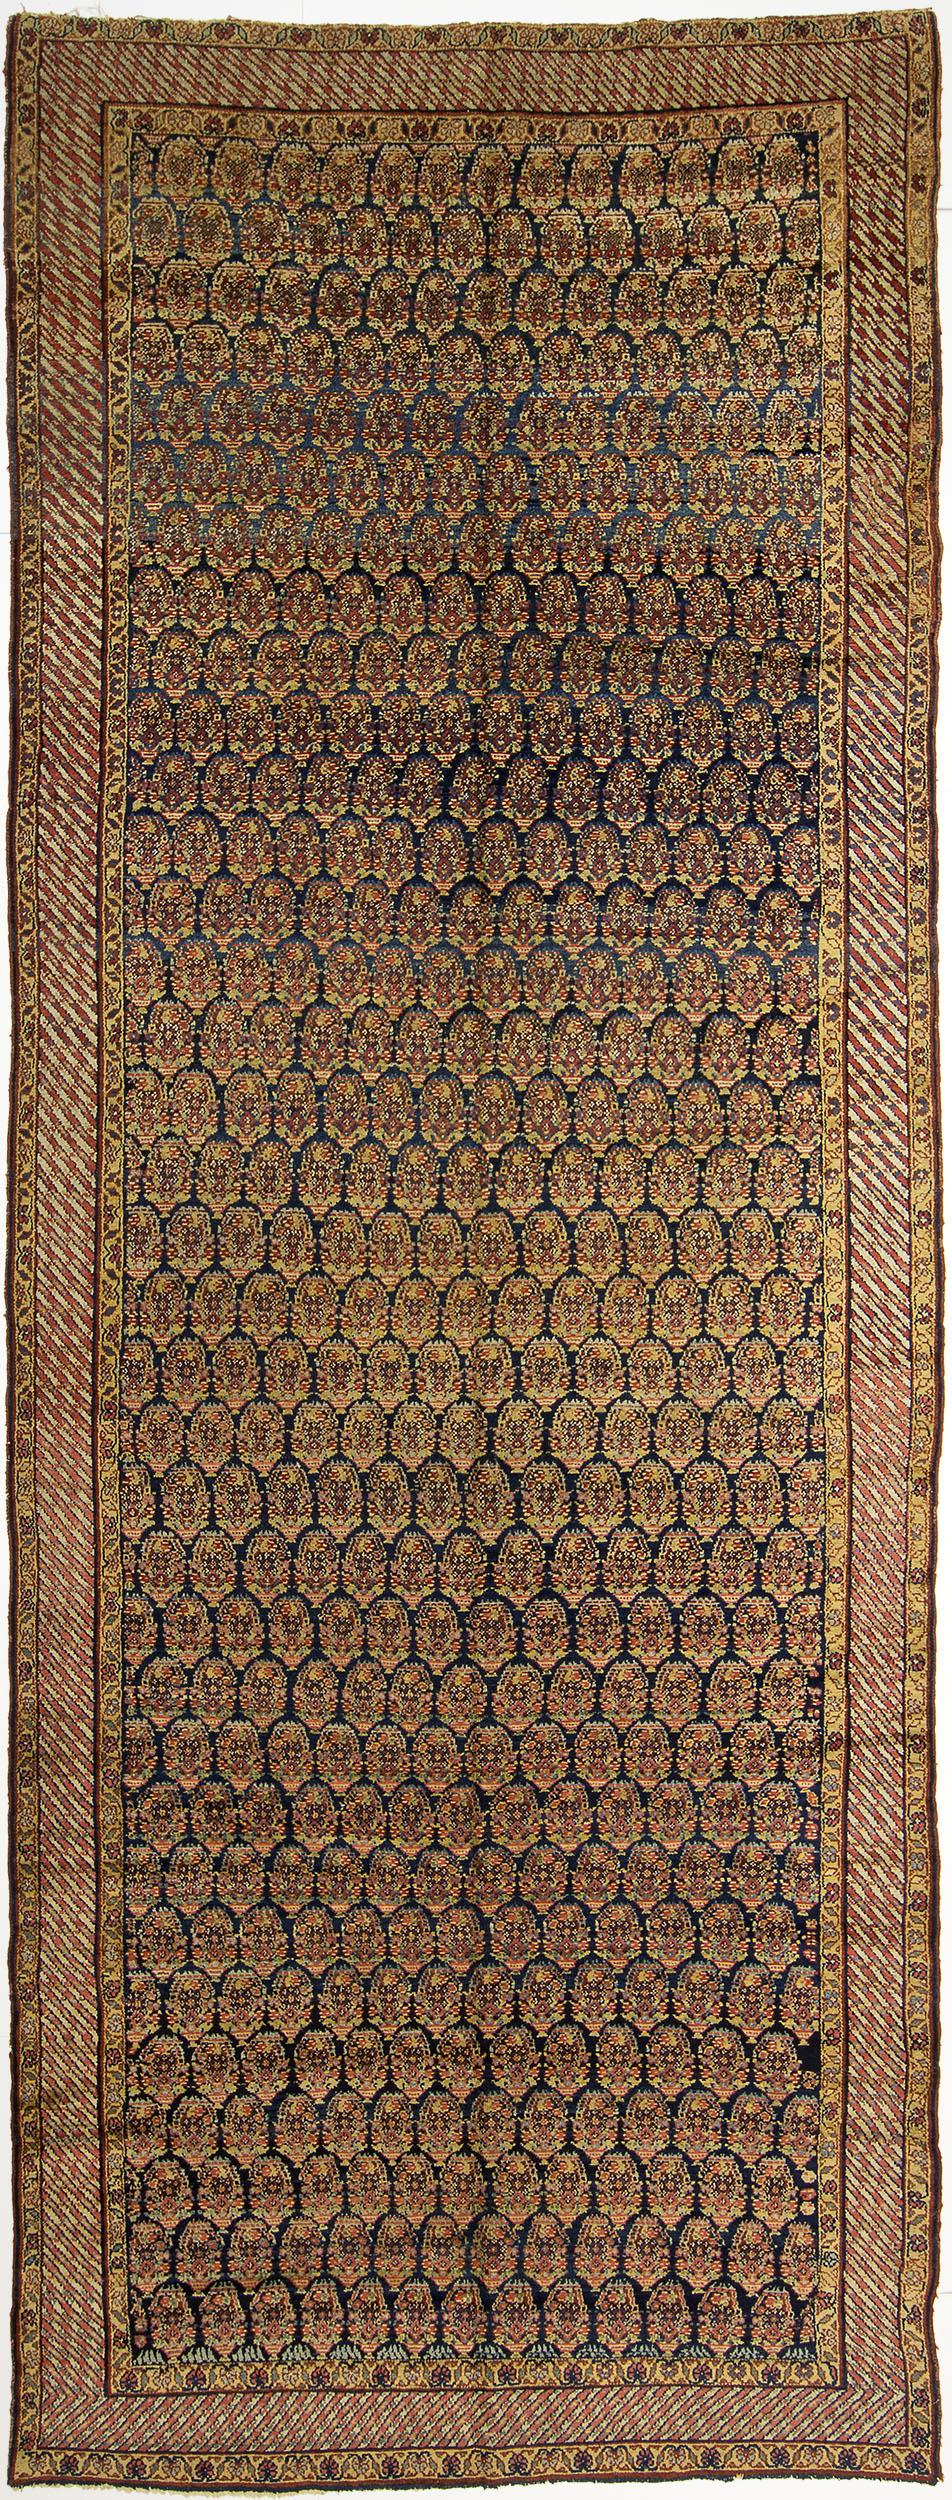 "Sehna Kurd Gallery Carpet 16' 3"" x 6' 2"""